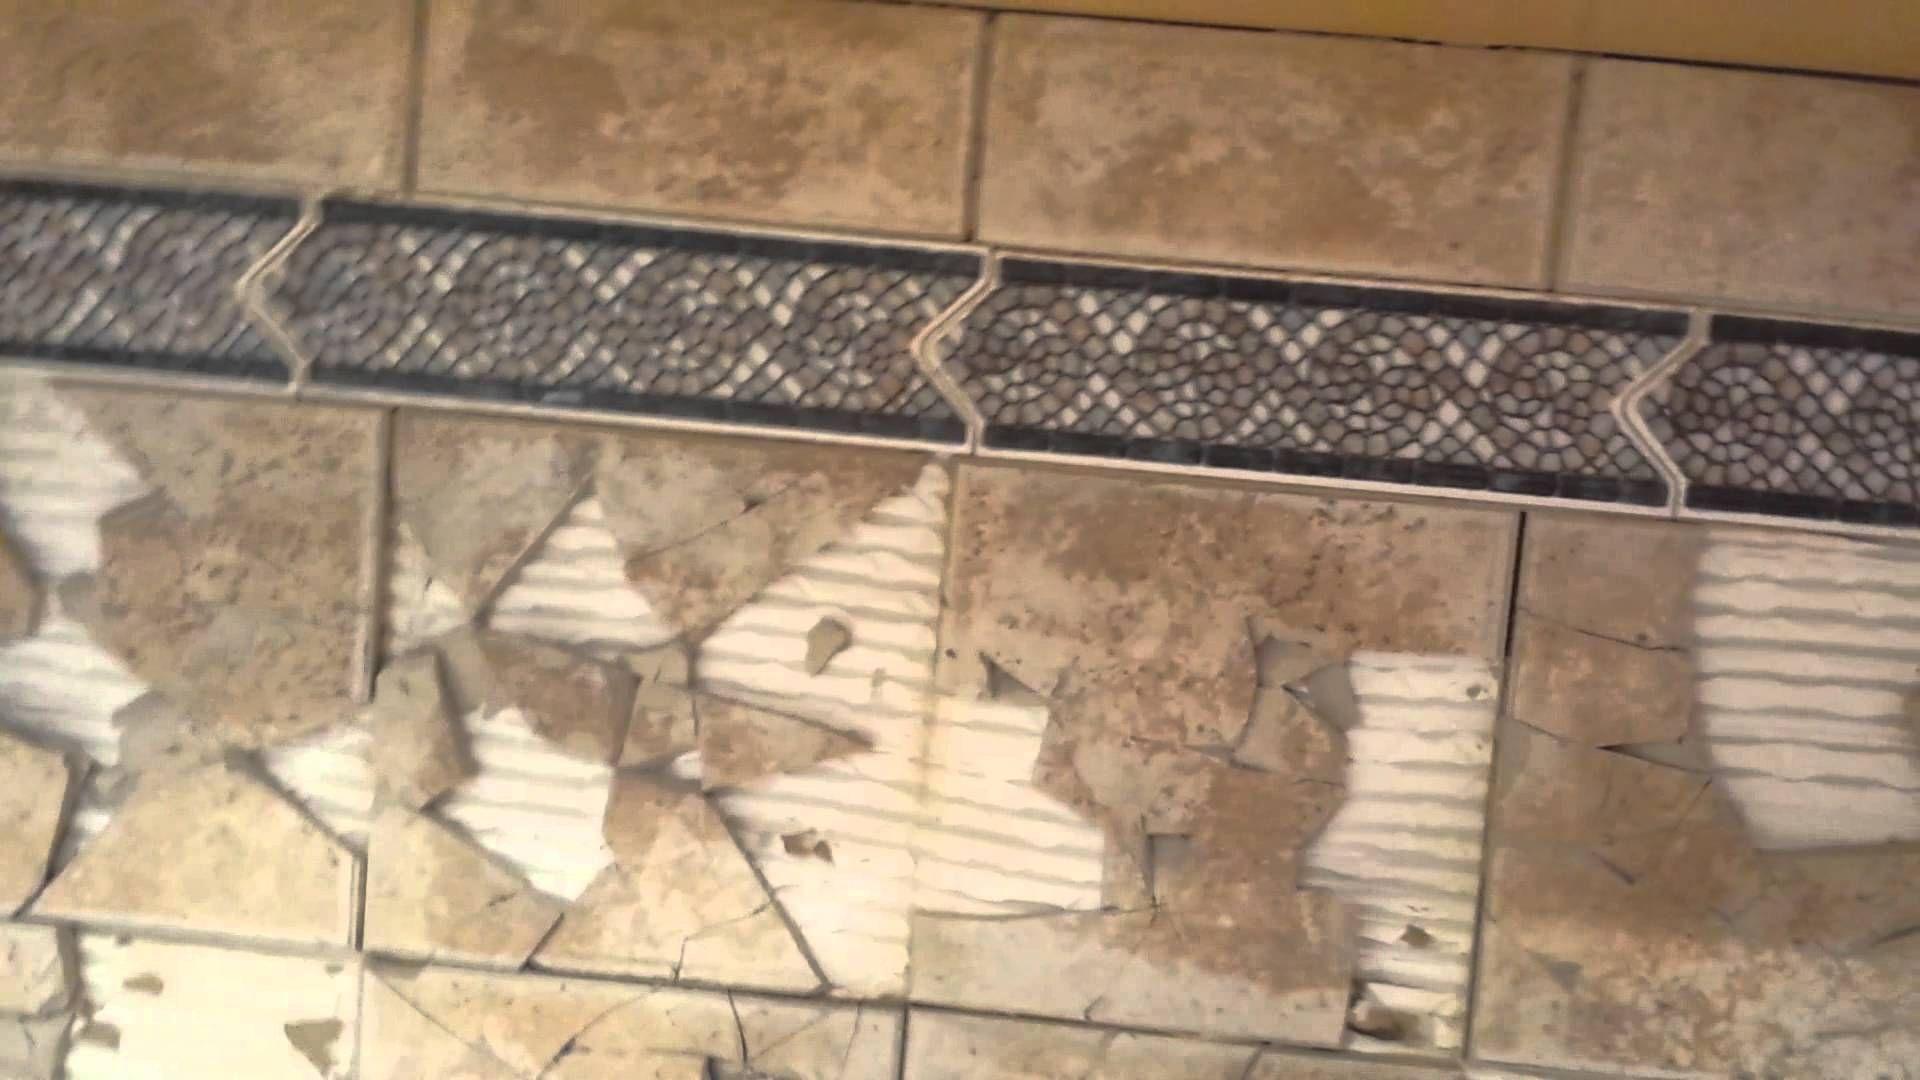 Tile Backsplash Removal Without Drywall Damage Youtube Tile